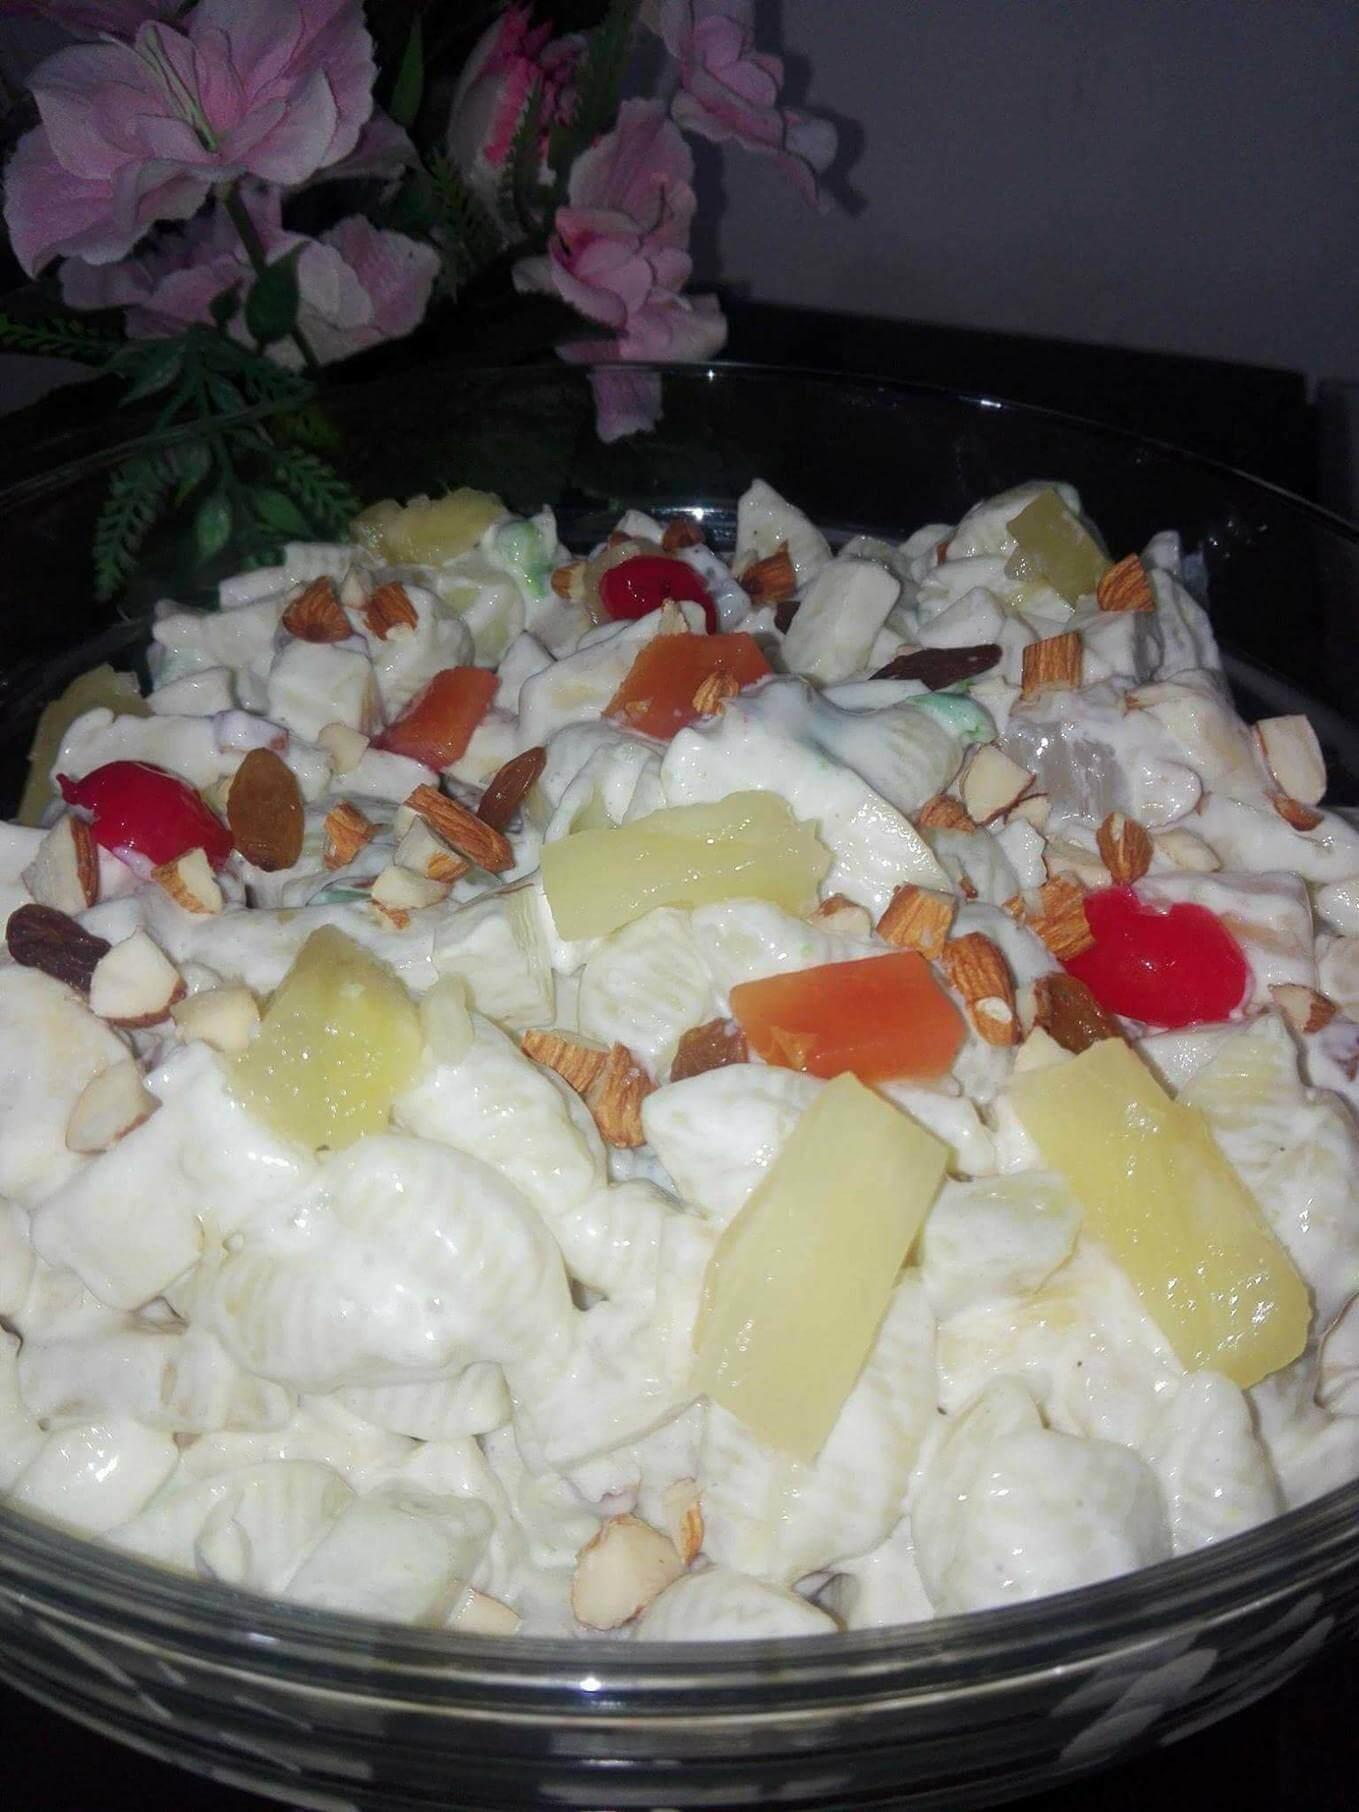 Tasty Healthy Creamy Russian Salad Recipe From Scratch